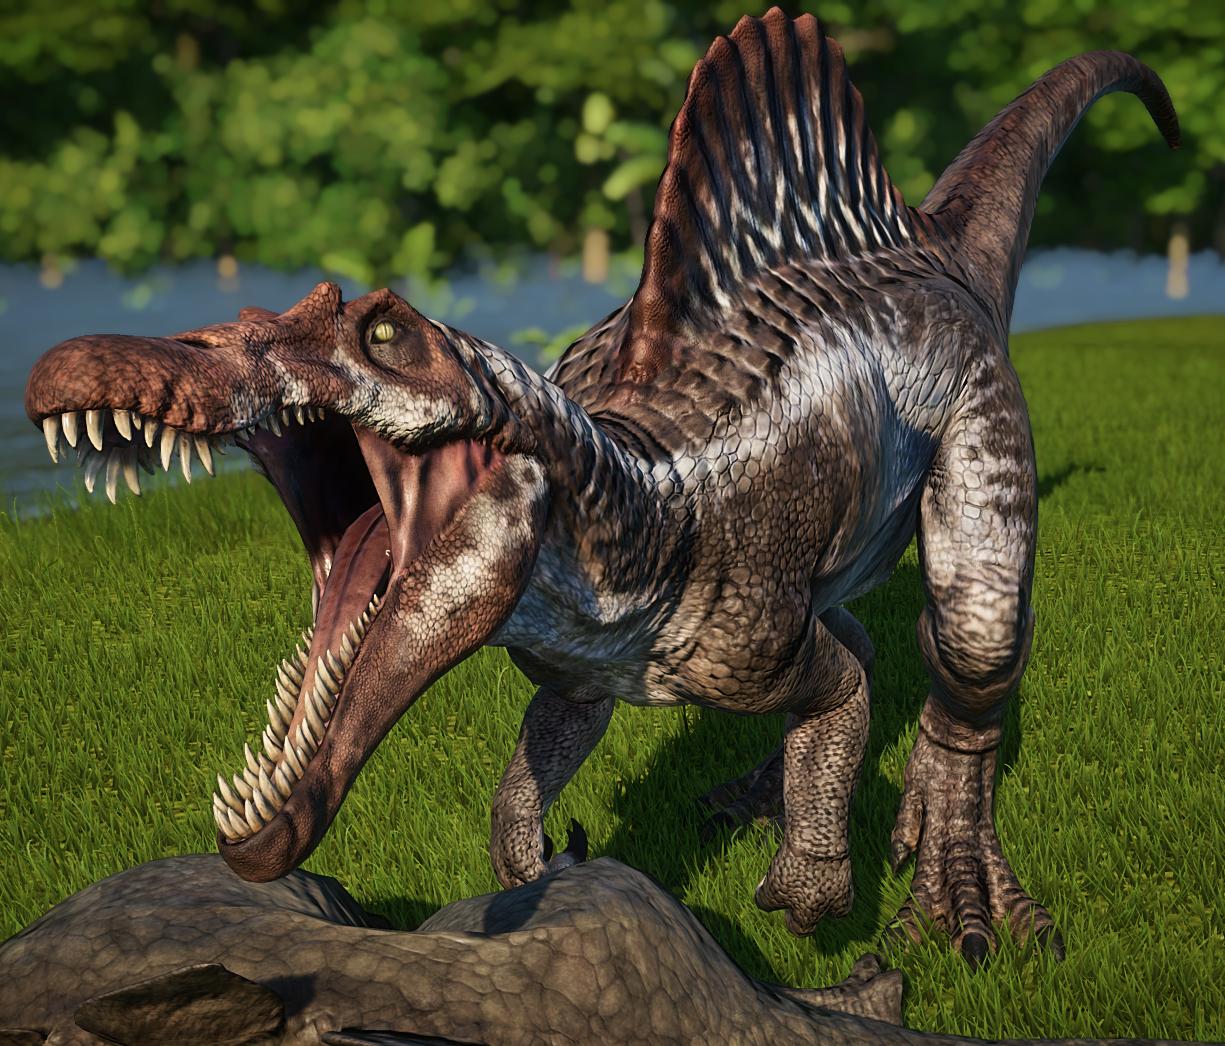 Spinosaurus Jurassic World Evolution Wiki Fandom Powered By Wikia In 2020 Spinosaurus Jurassic World Dinosaurs Jurassic Park World